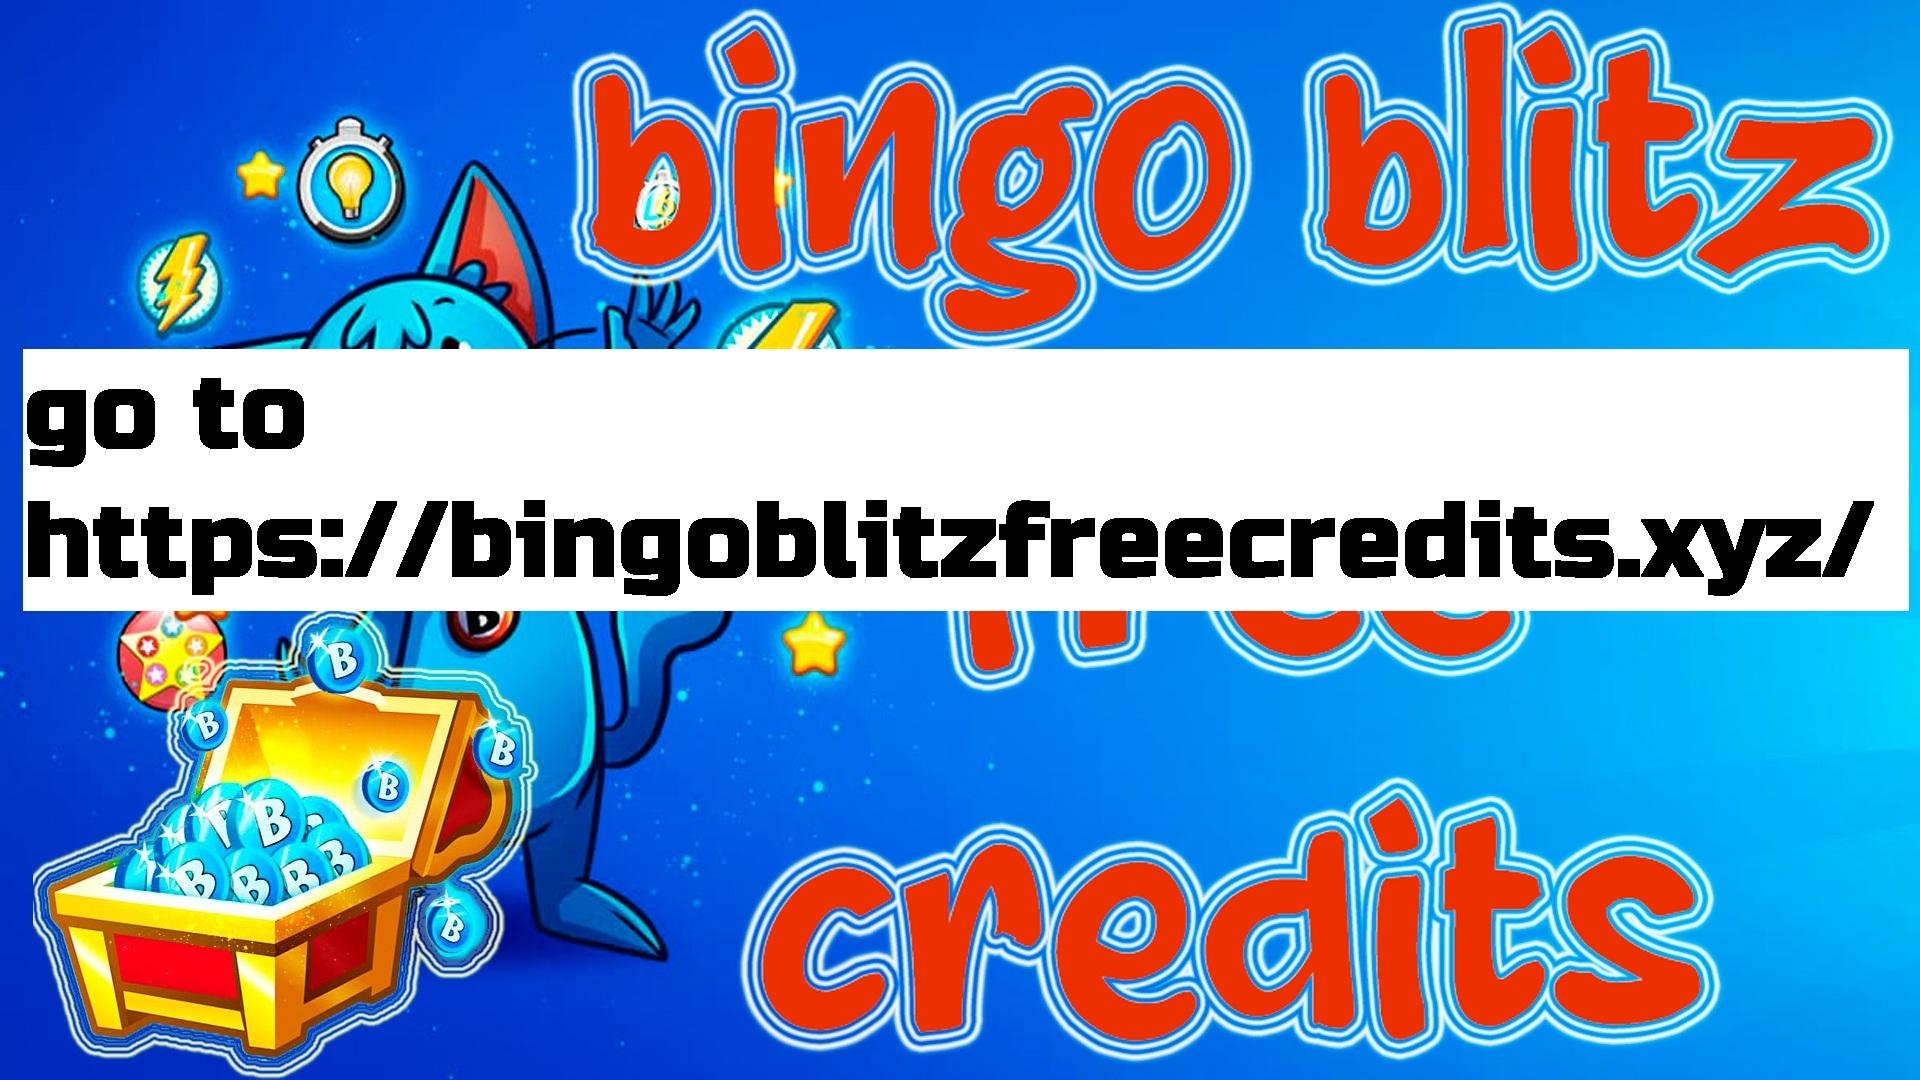 bingo blitz free credits (@bingoblitzfreecredits) Cover Image